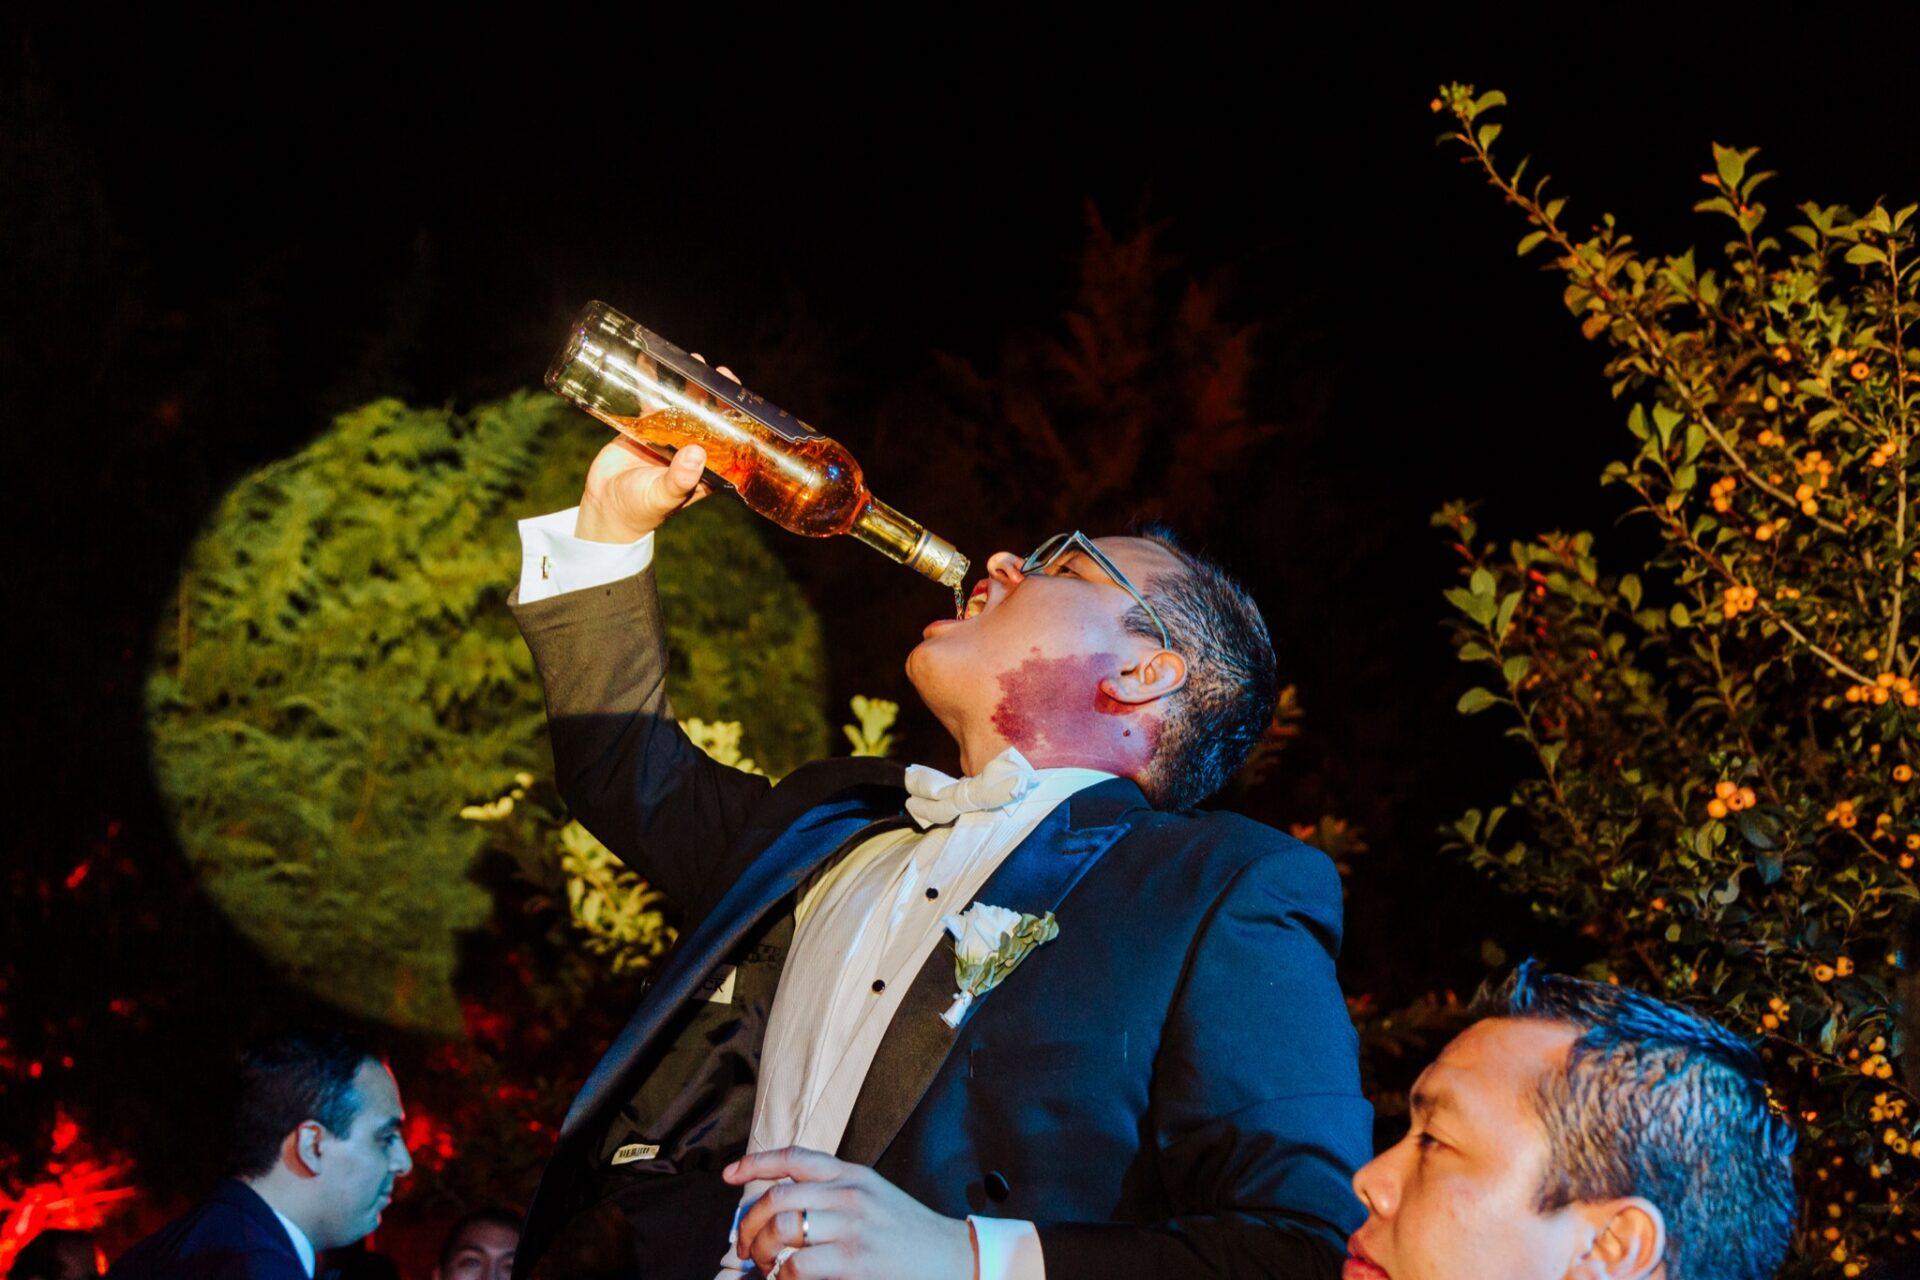 javier_noriega_fotografo_bodas_teul_zacatecas_wedding_photographer49